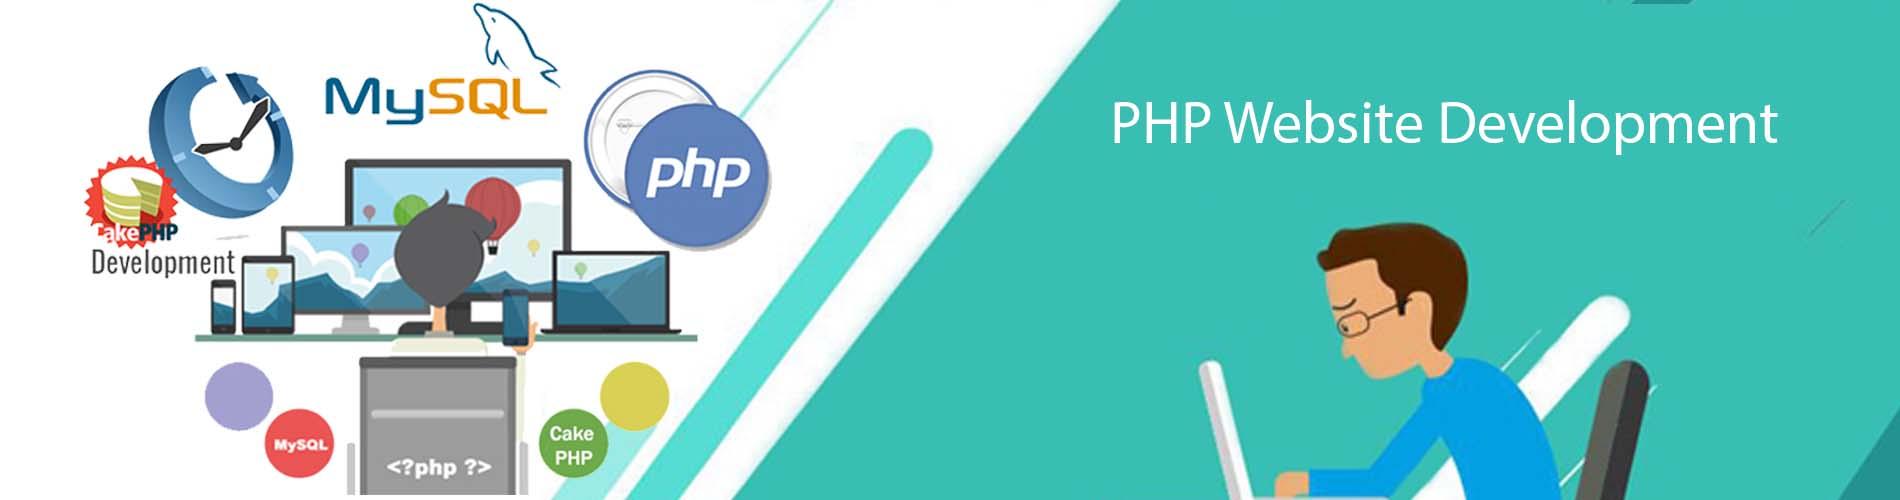 php-website-development-company